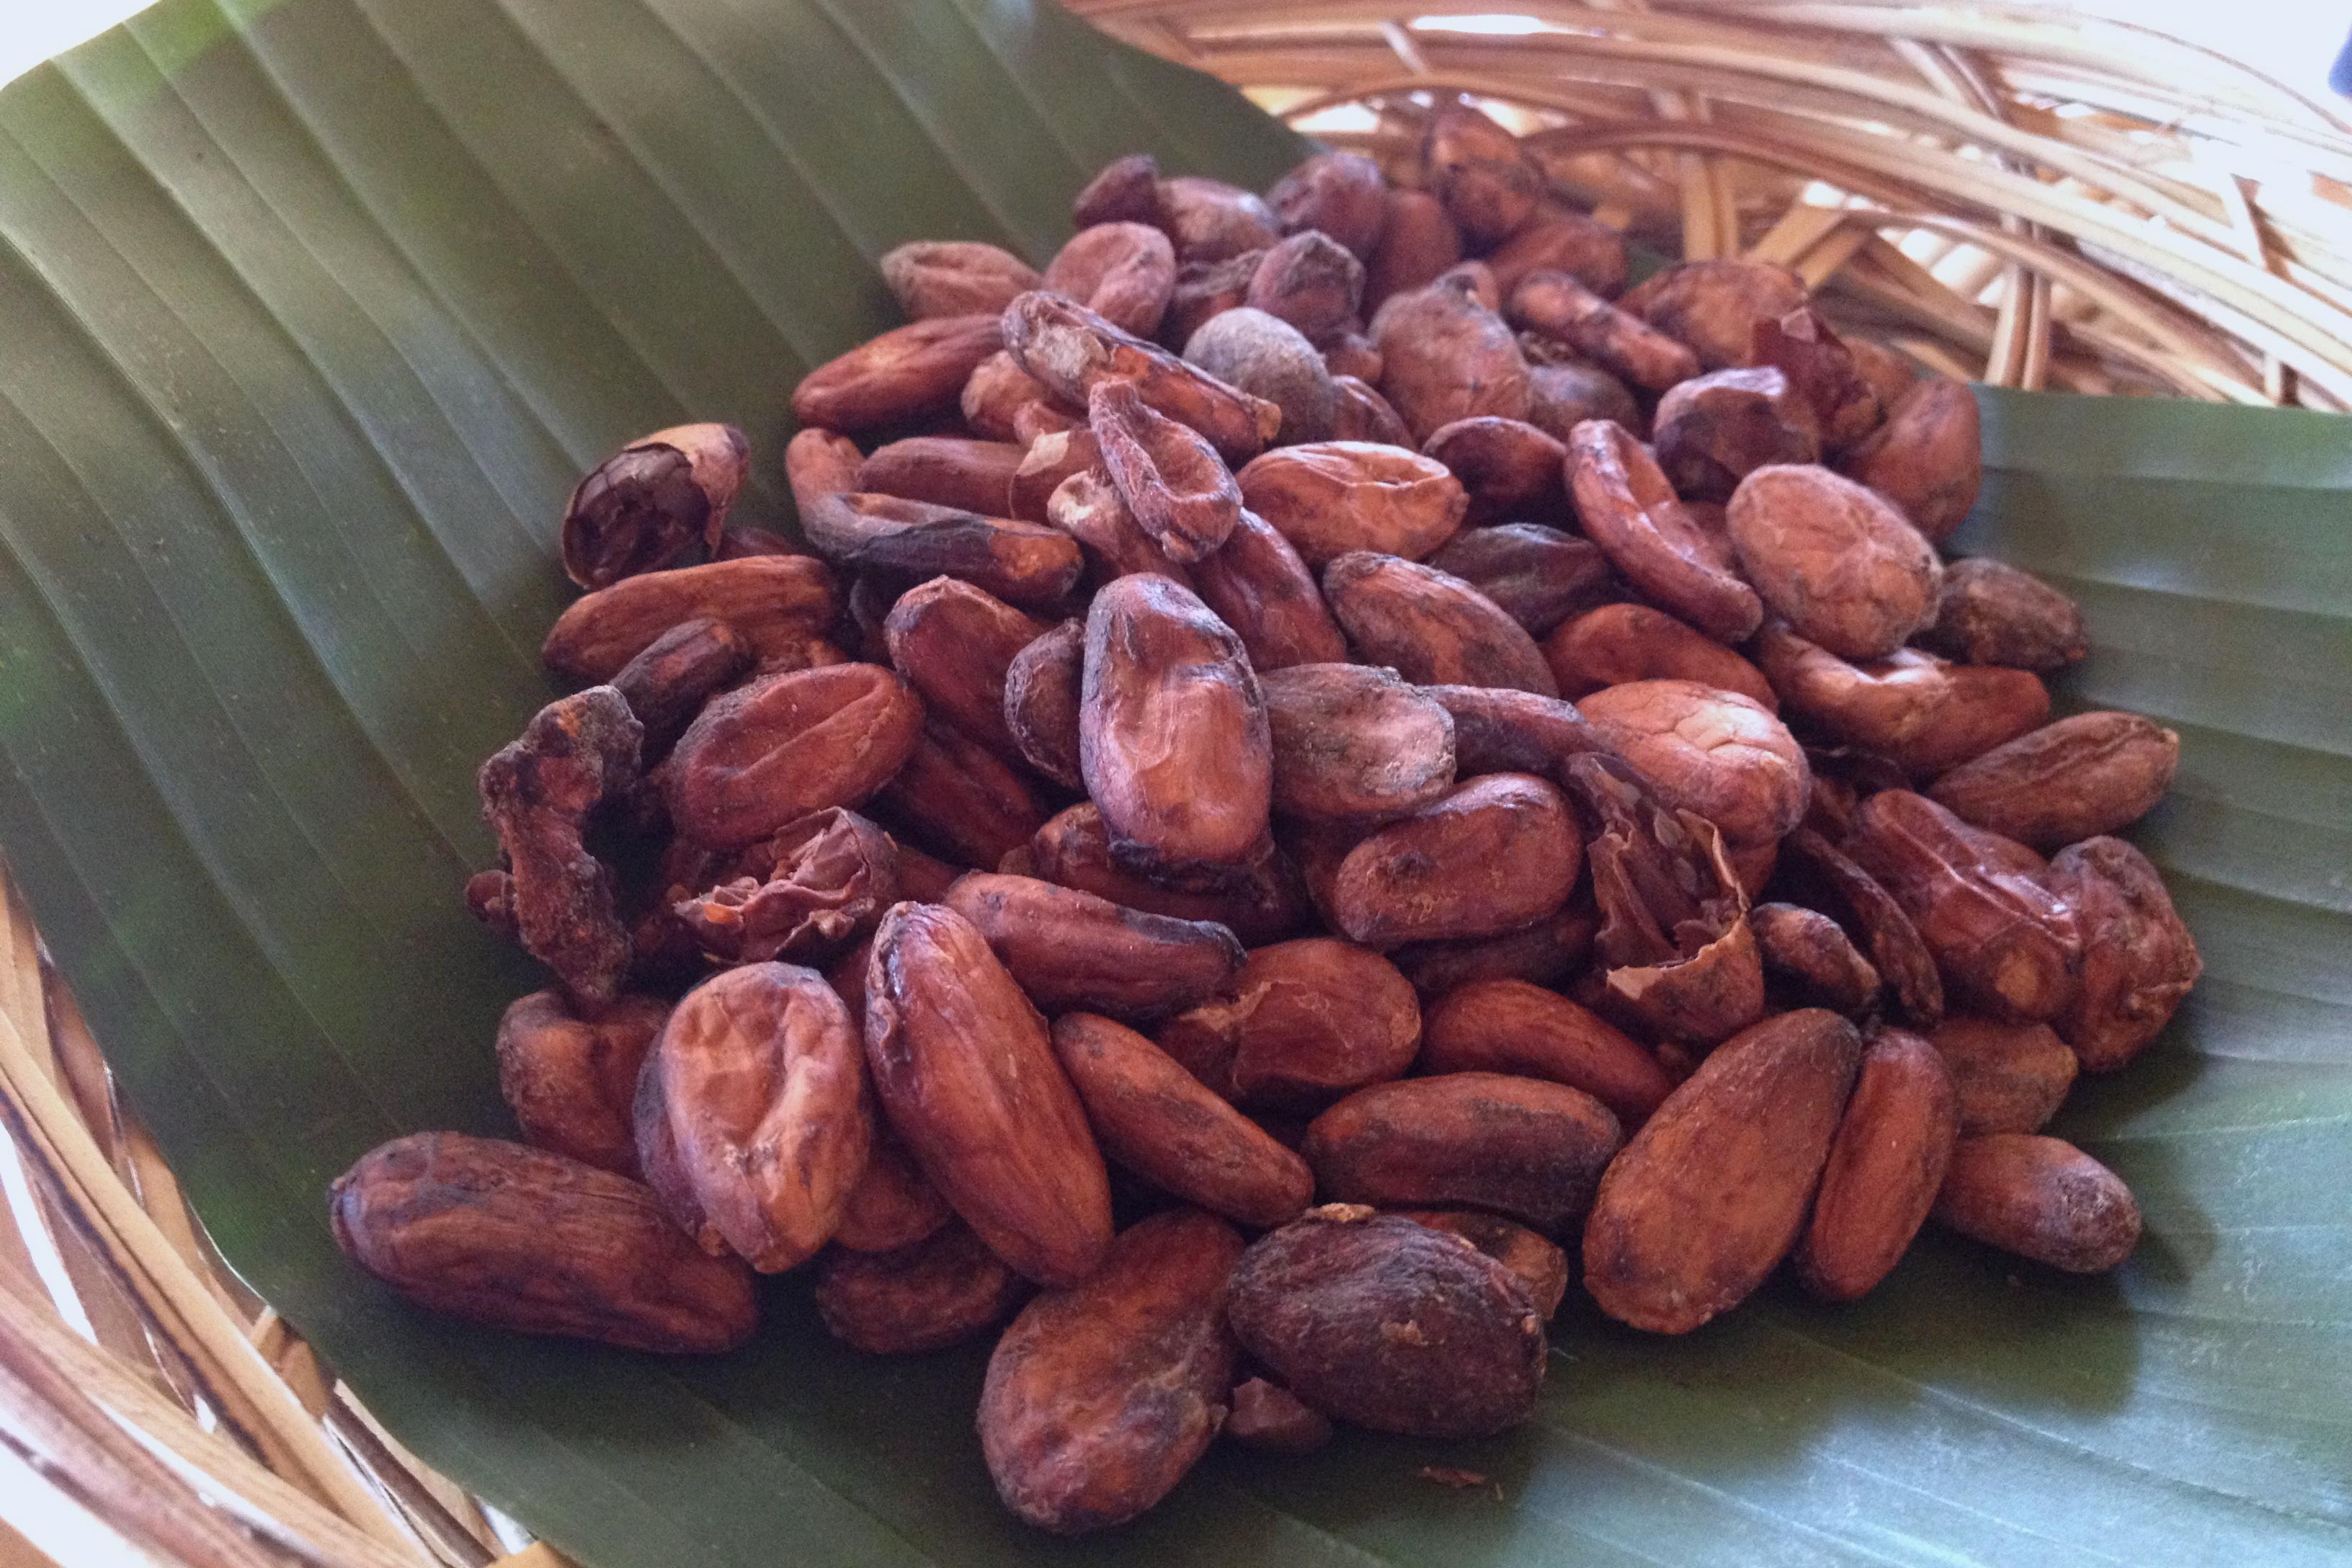 Big Tree Farms chocolate factory | KitchenCoop